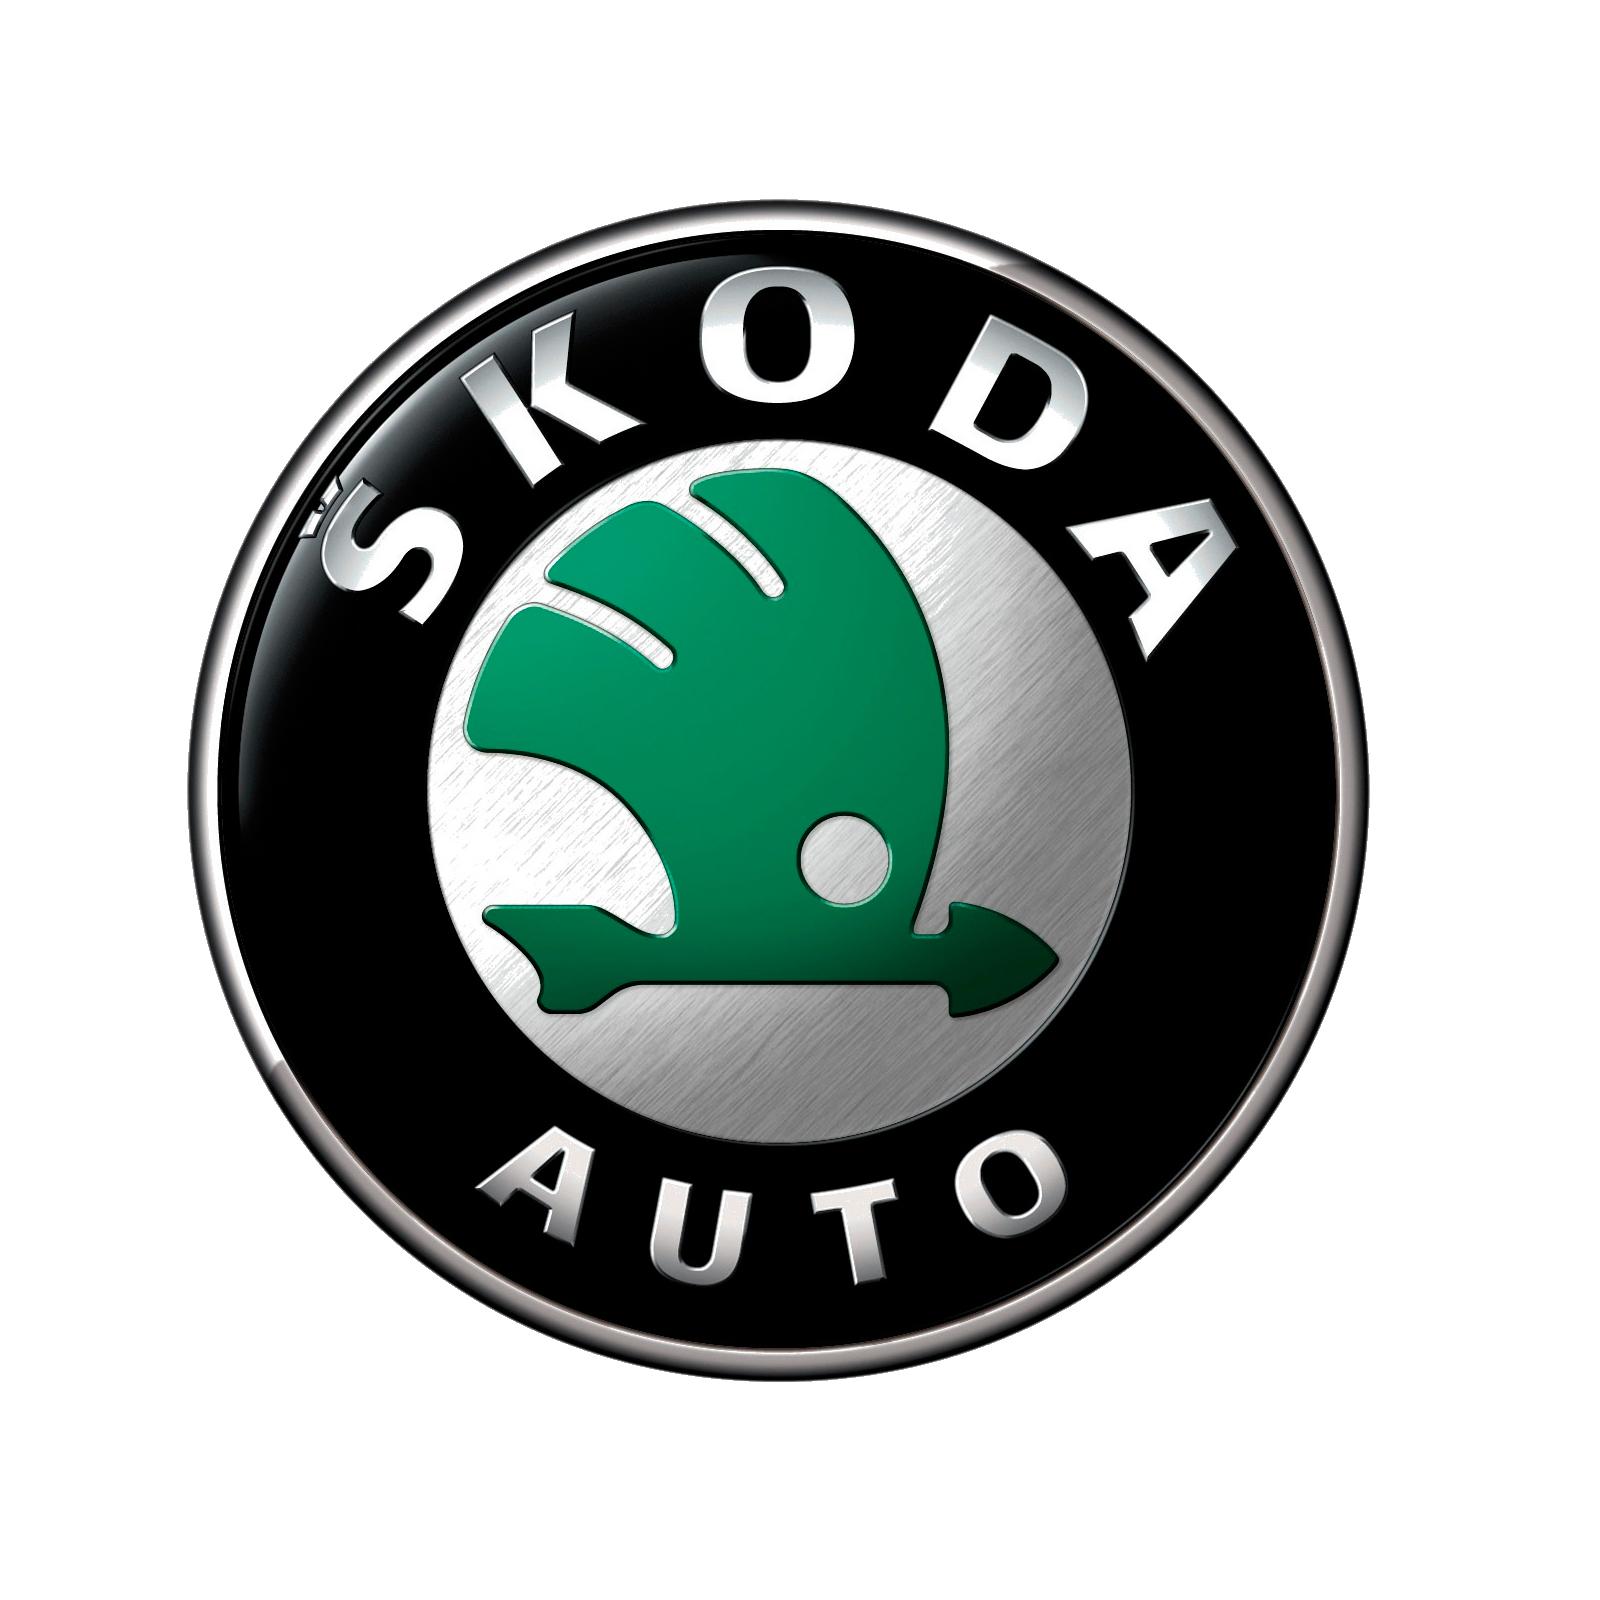 Car Manuals, Skoda